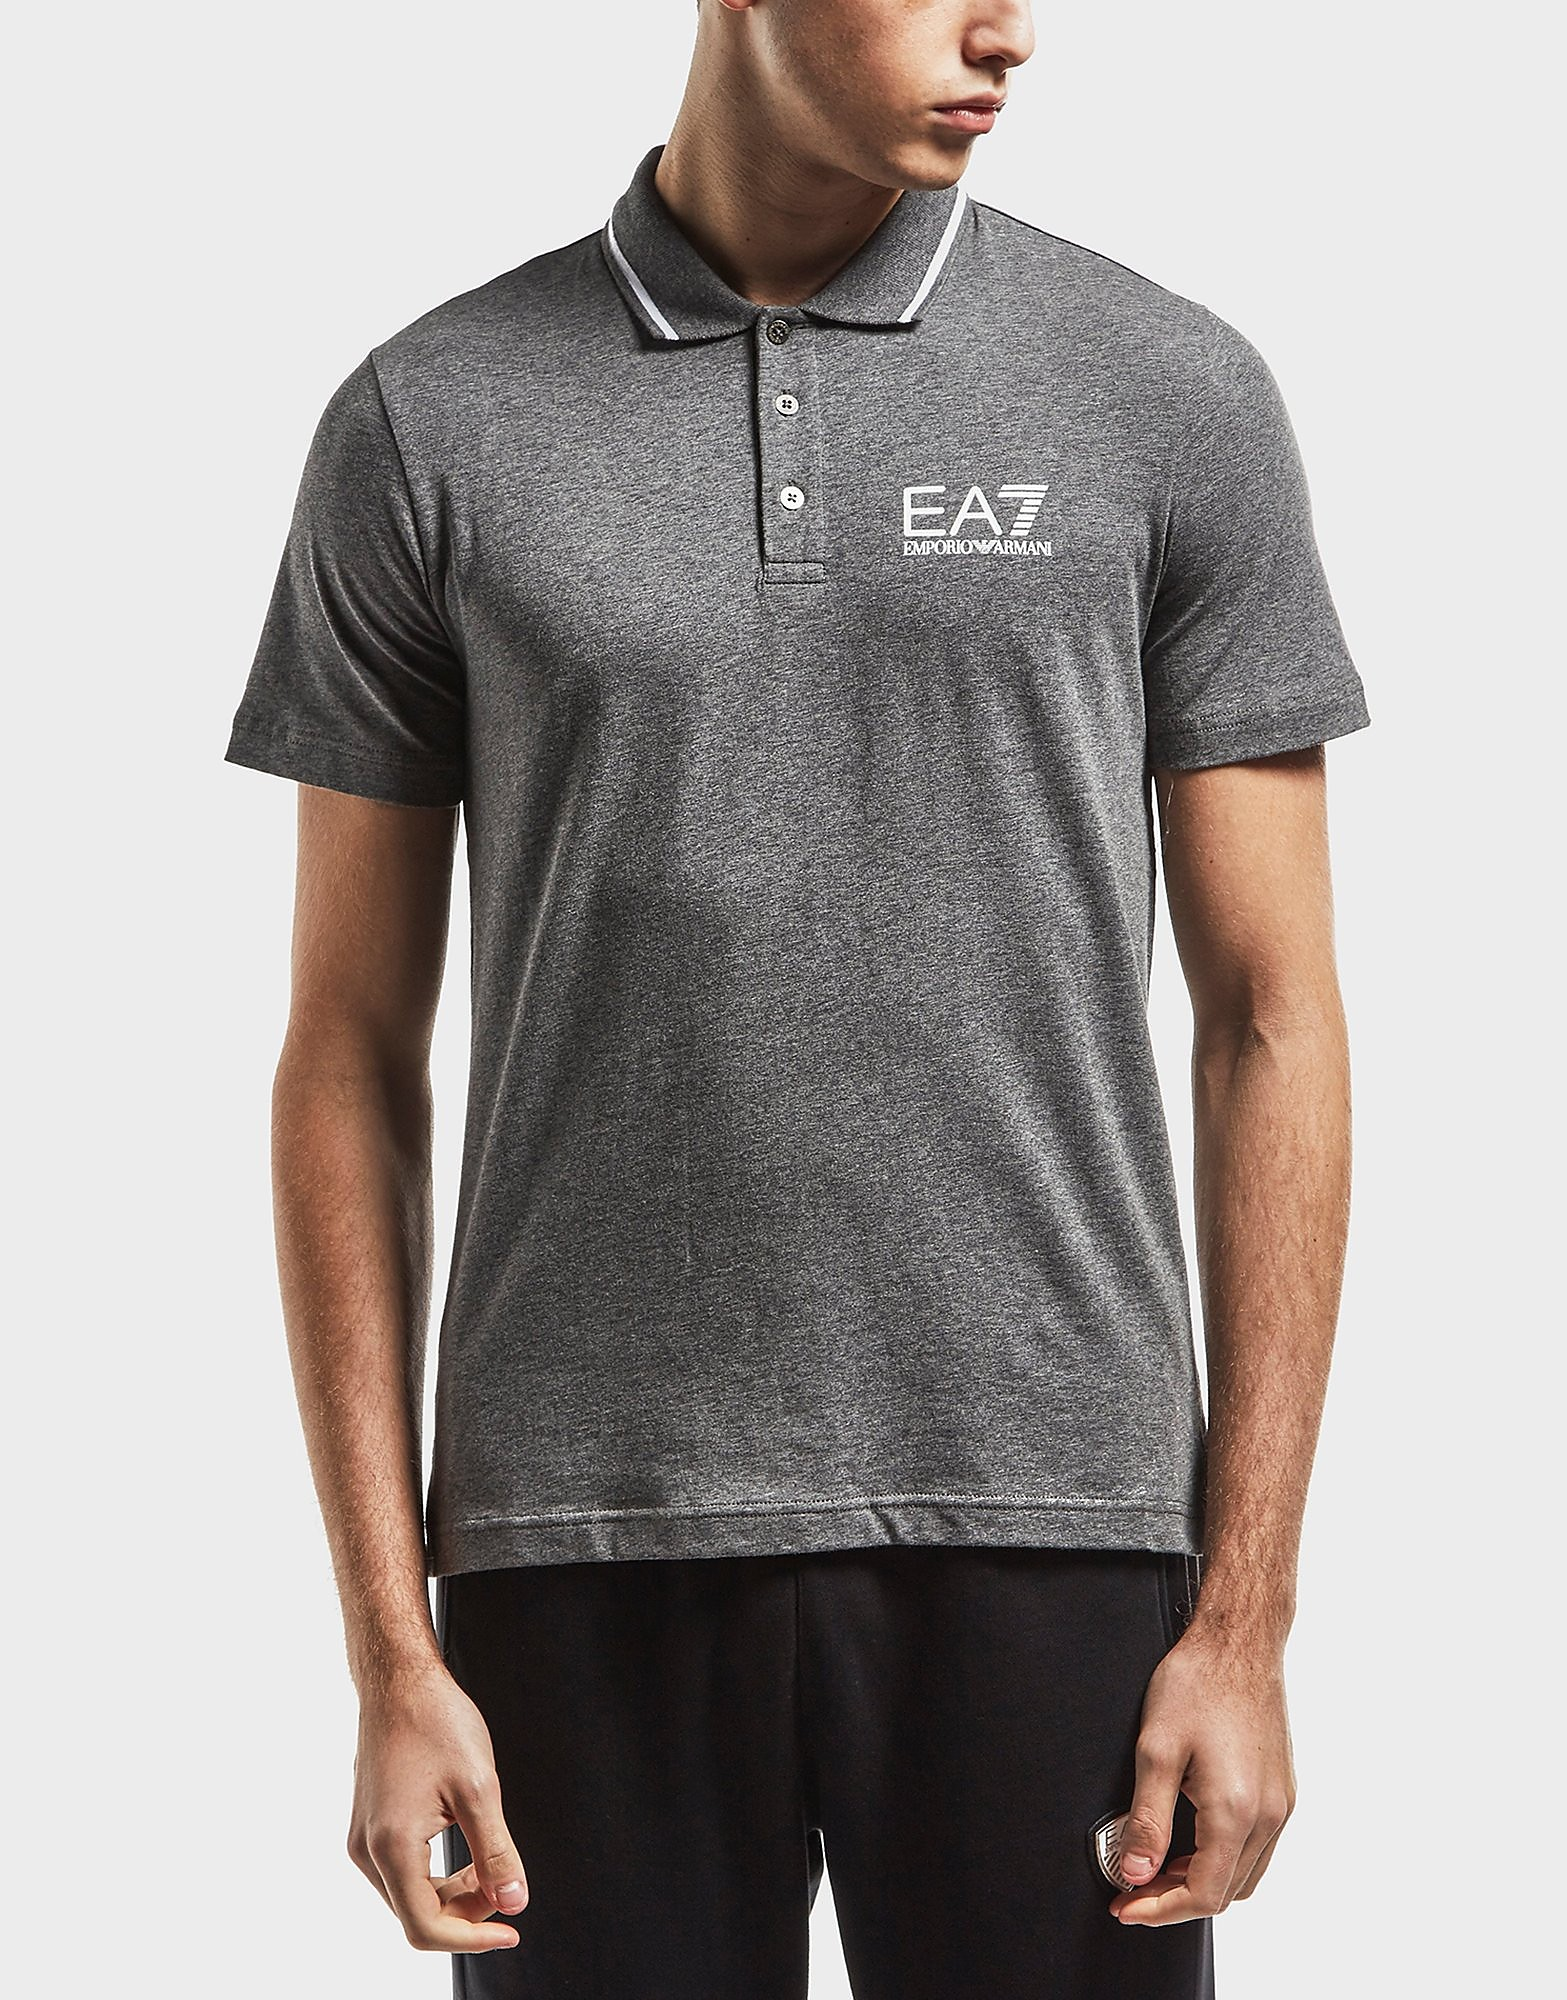 Emporio Armani EA7 Train Core Jersey Polo Shirt